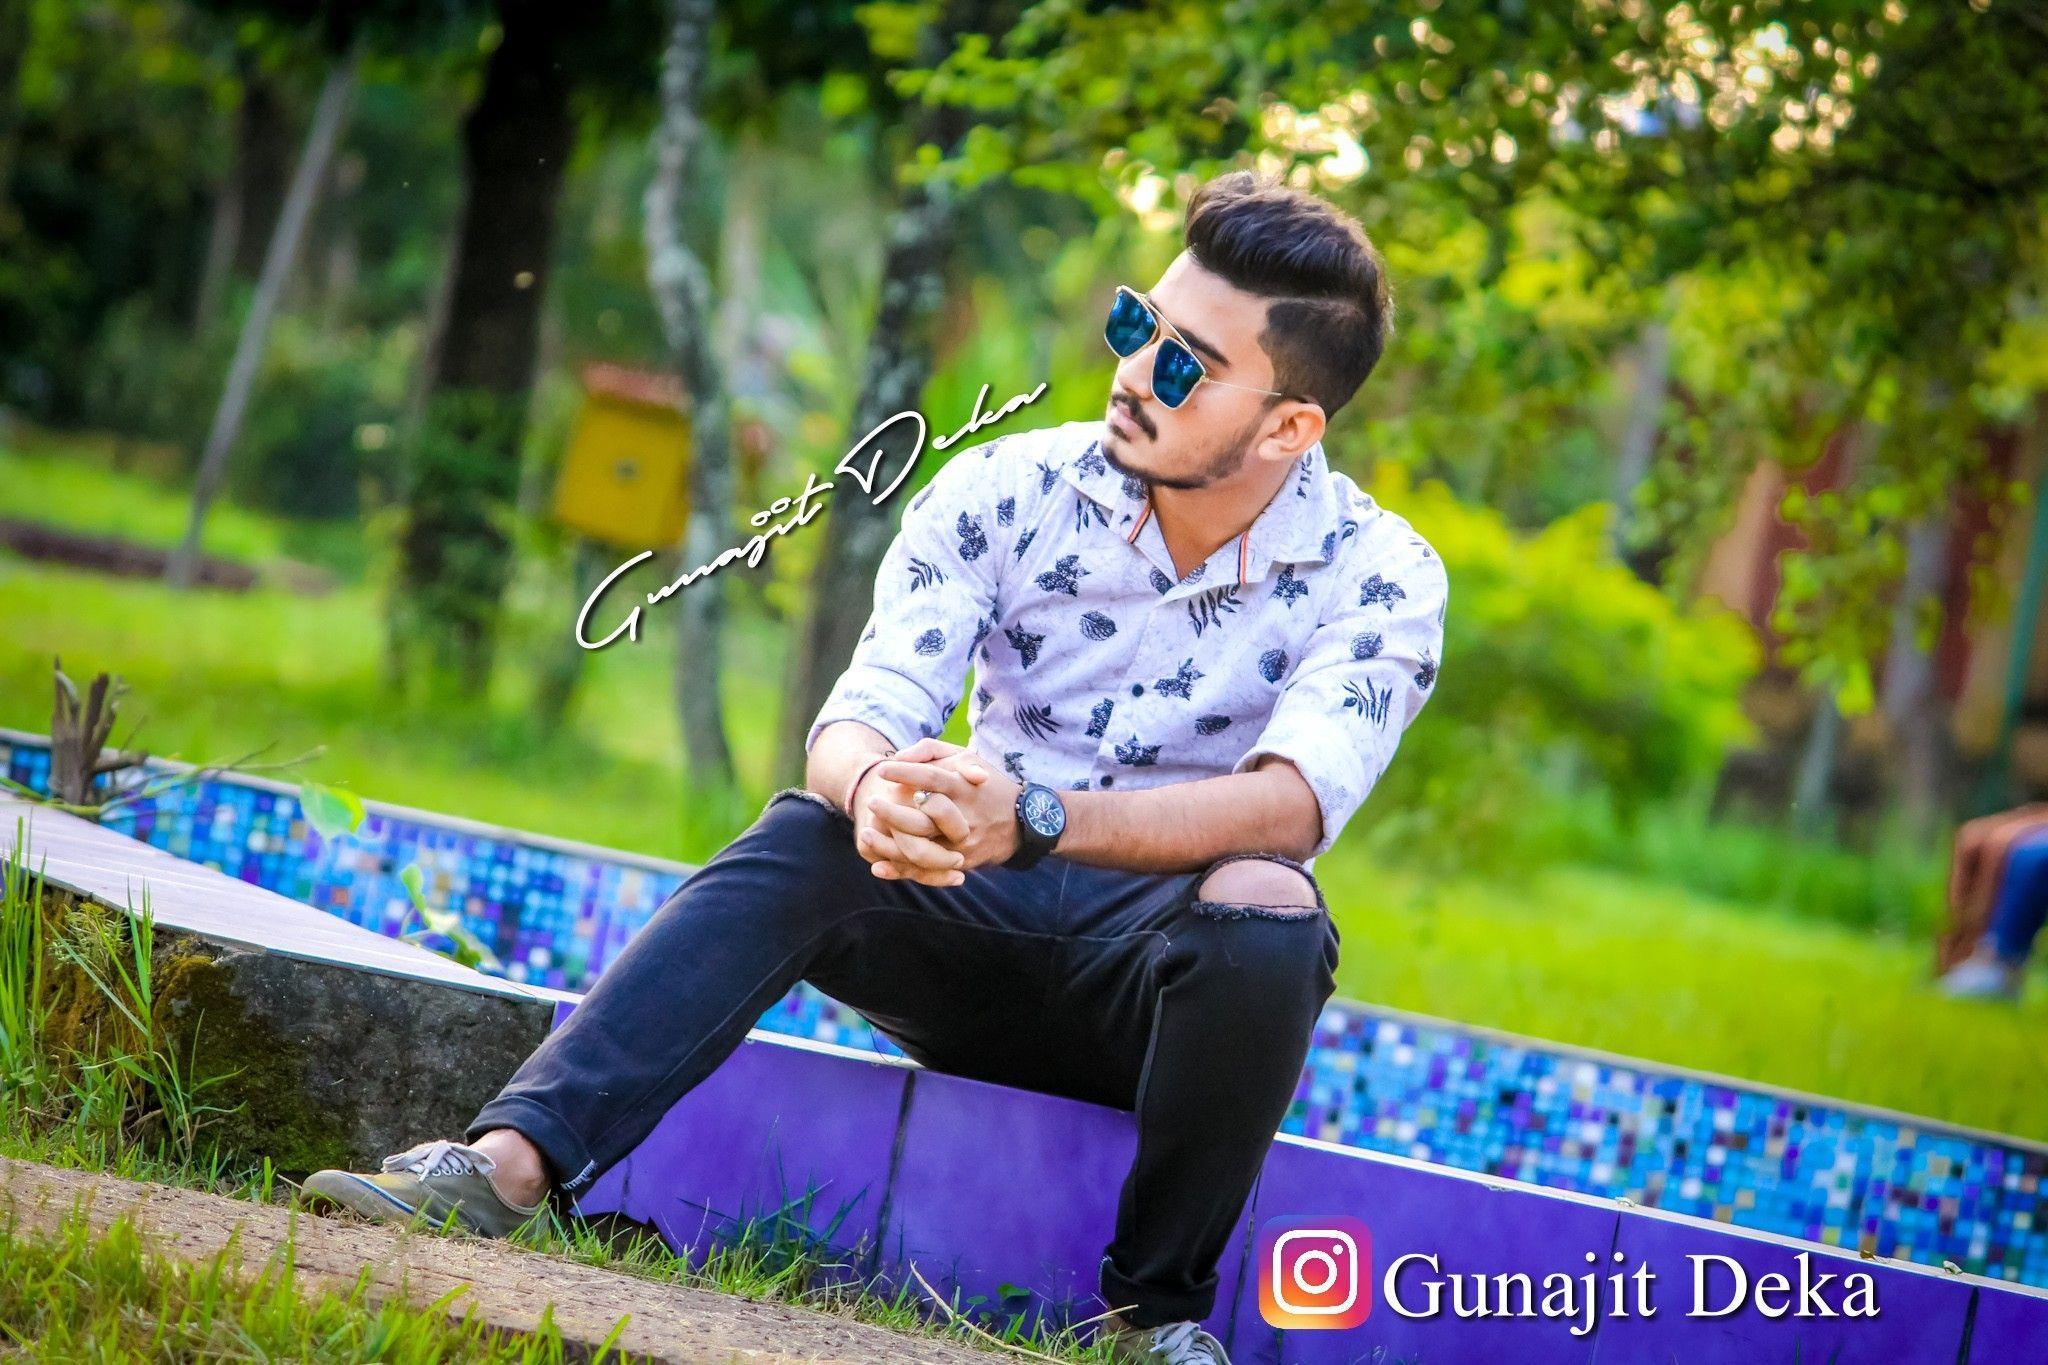 Gunajit Dekha Boy Photos Handsome Boy Photo Handsome Boys